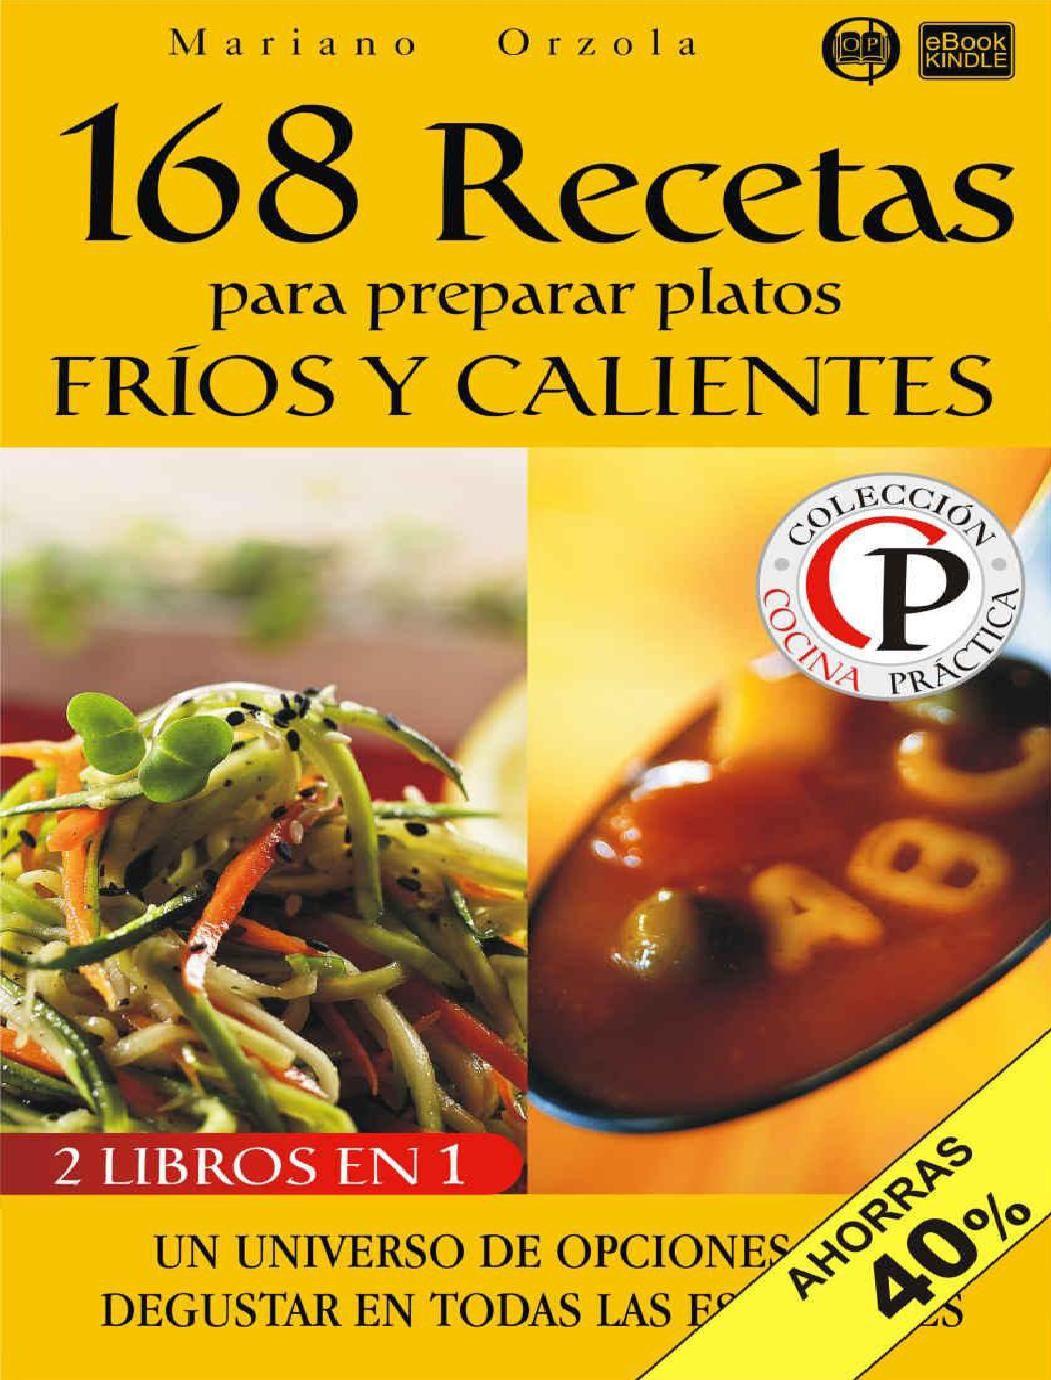 b5098a97fcd326b10afb88541bb18940 - Cocinar Recetas